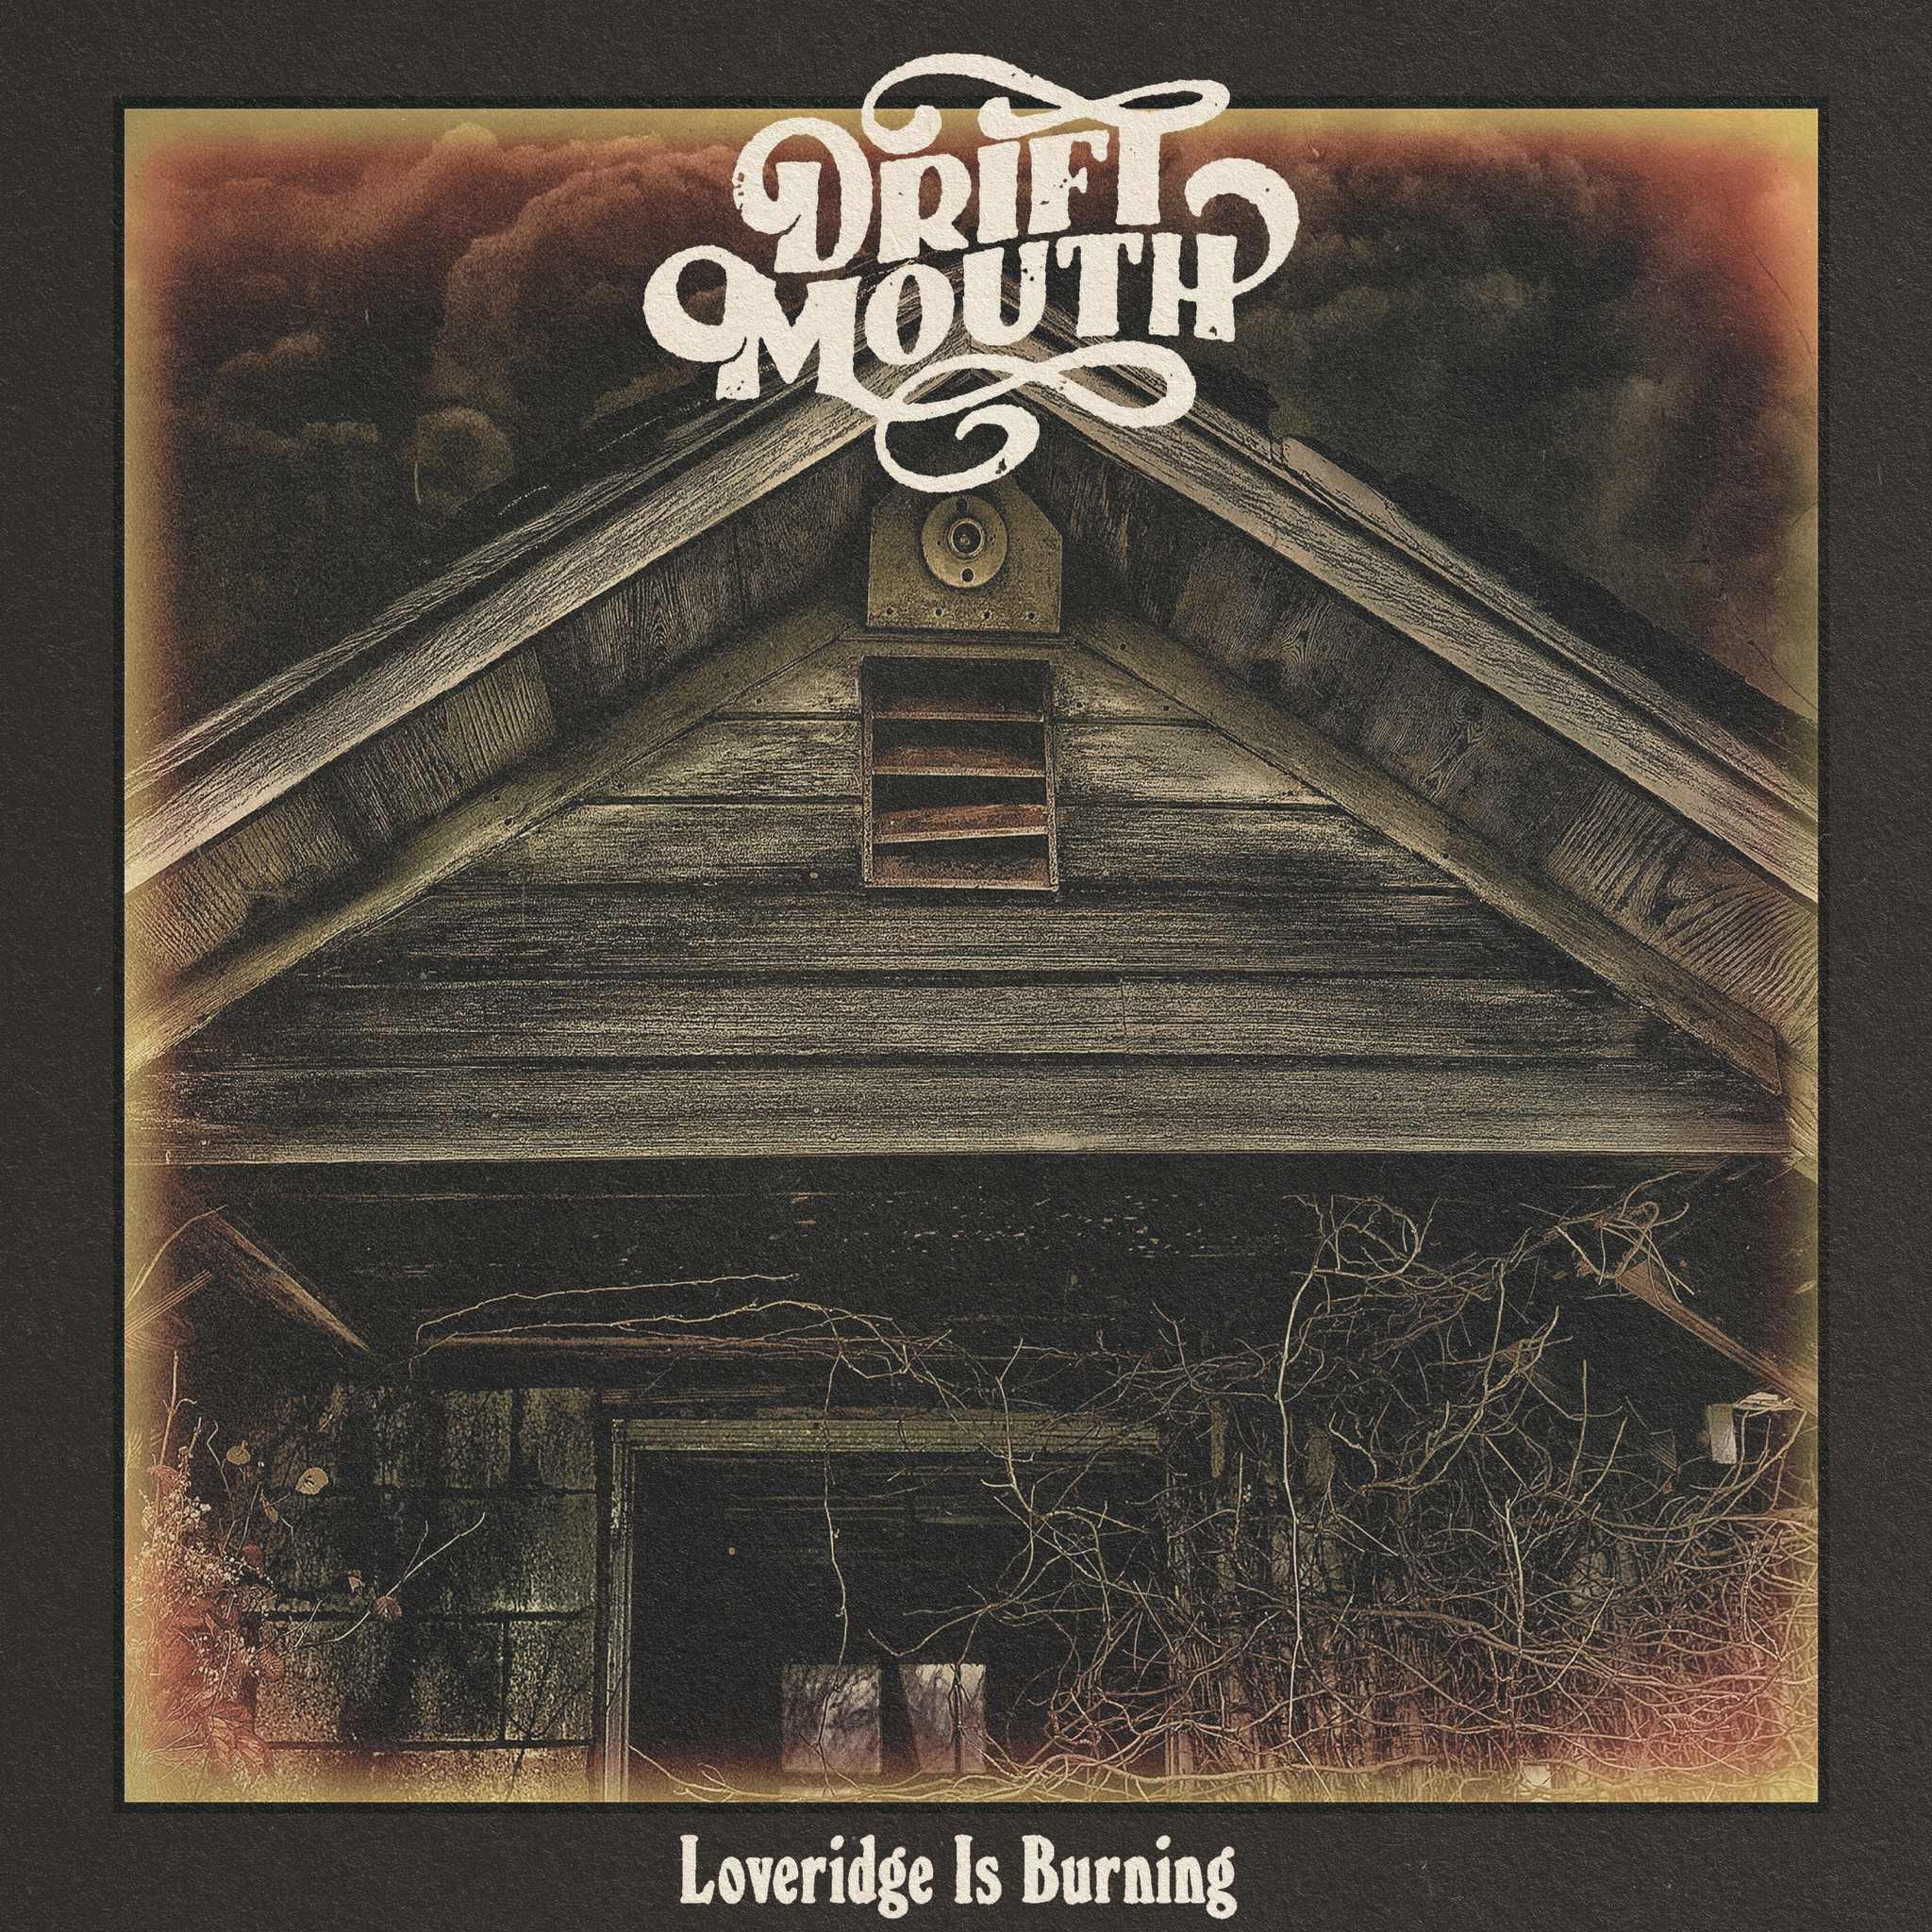 Drift Mouth - Loveridge Is Burning